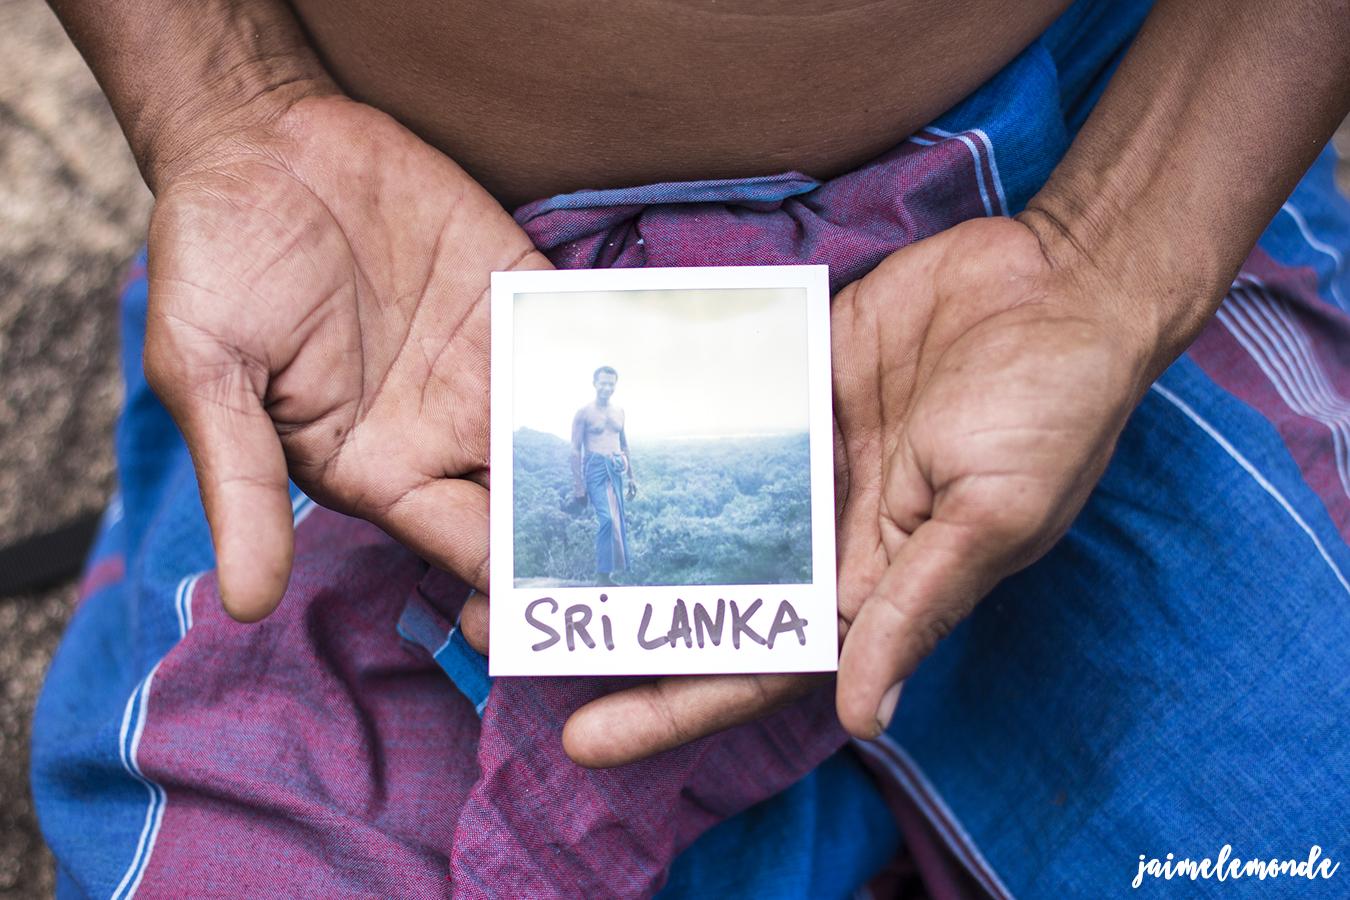 des-polas-et-des-mains-voyage-au-sri-lanka-2016-jaimelemonde-2